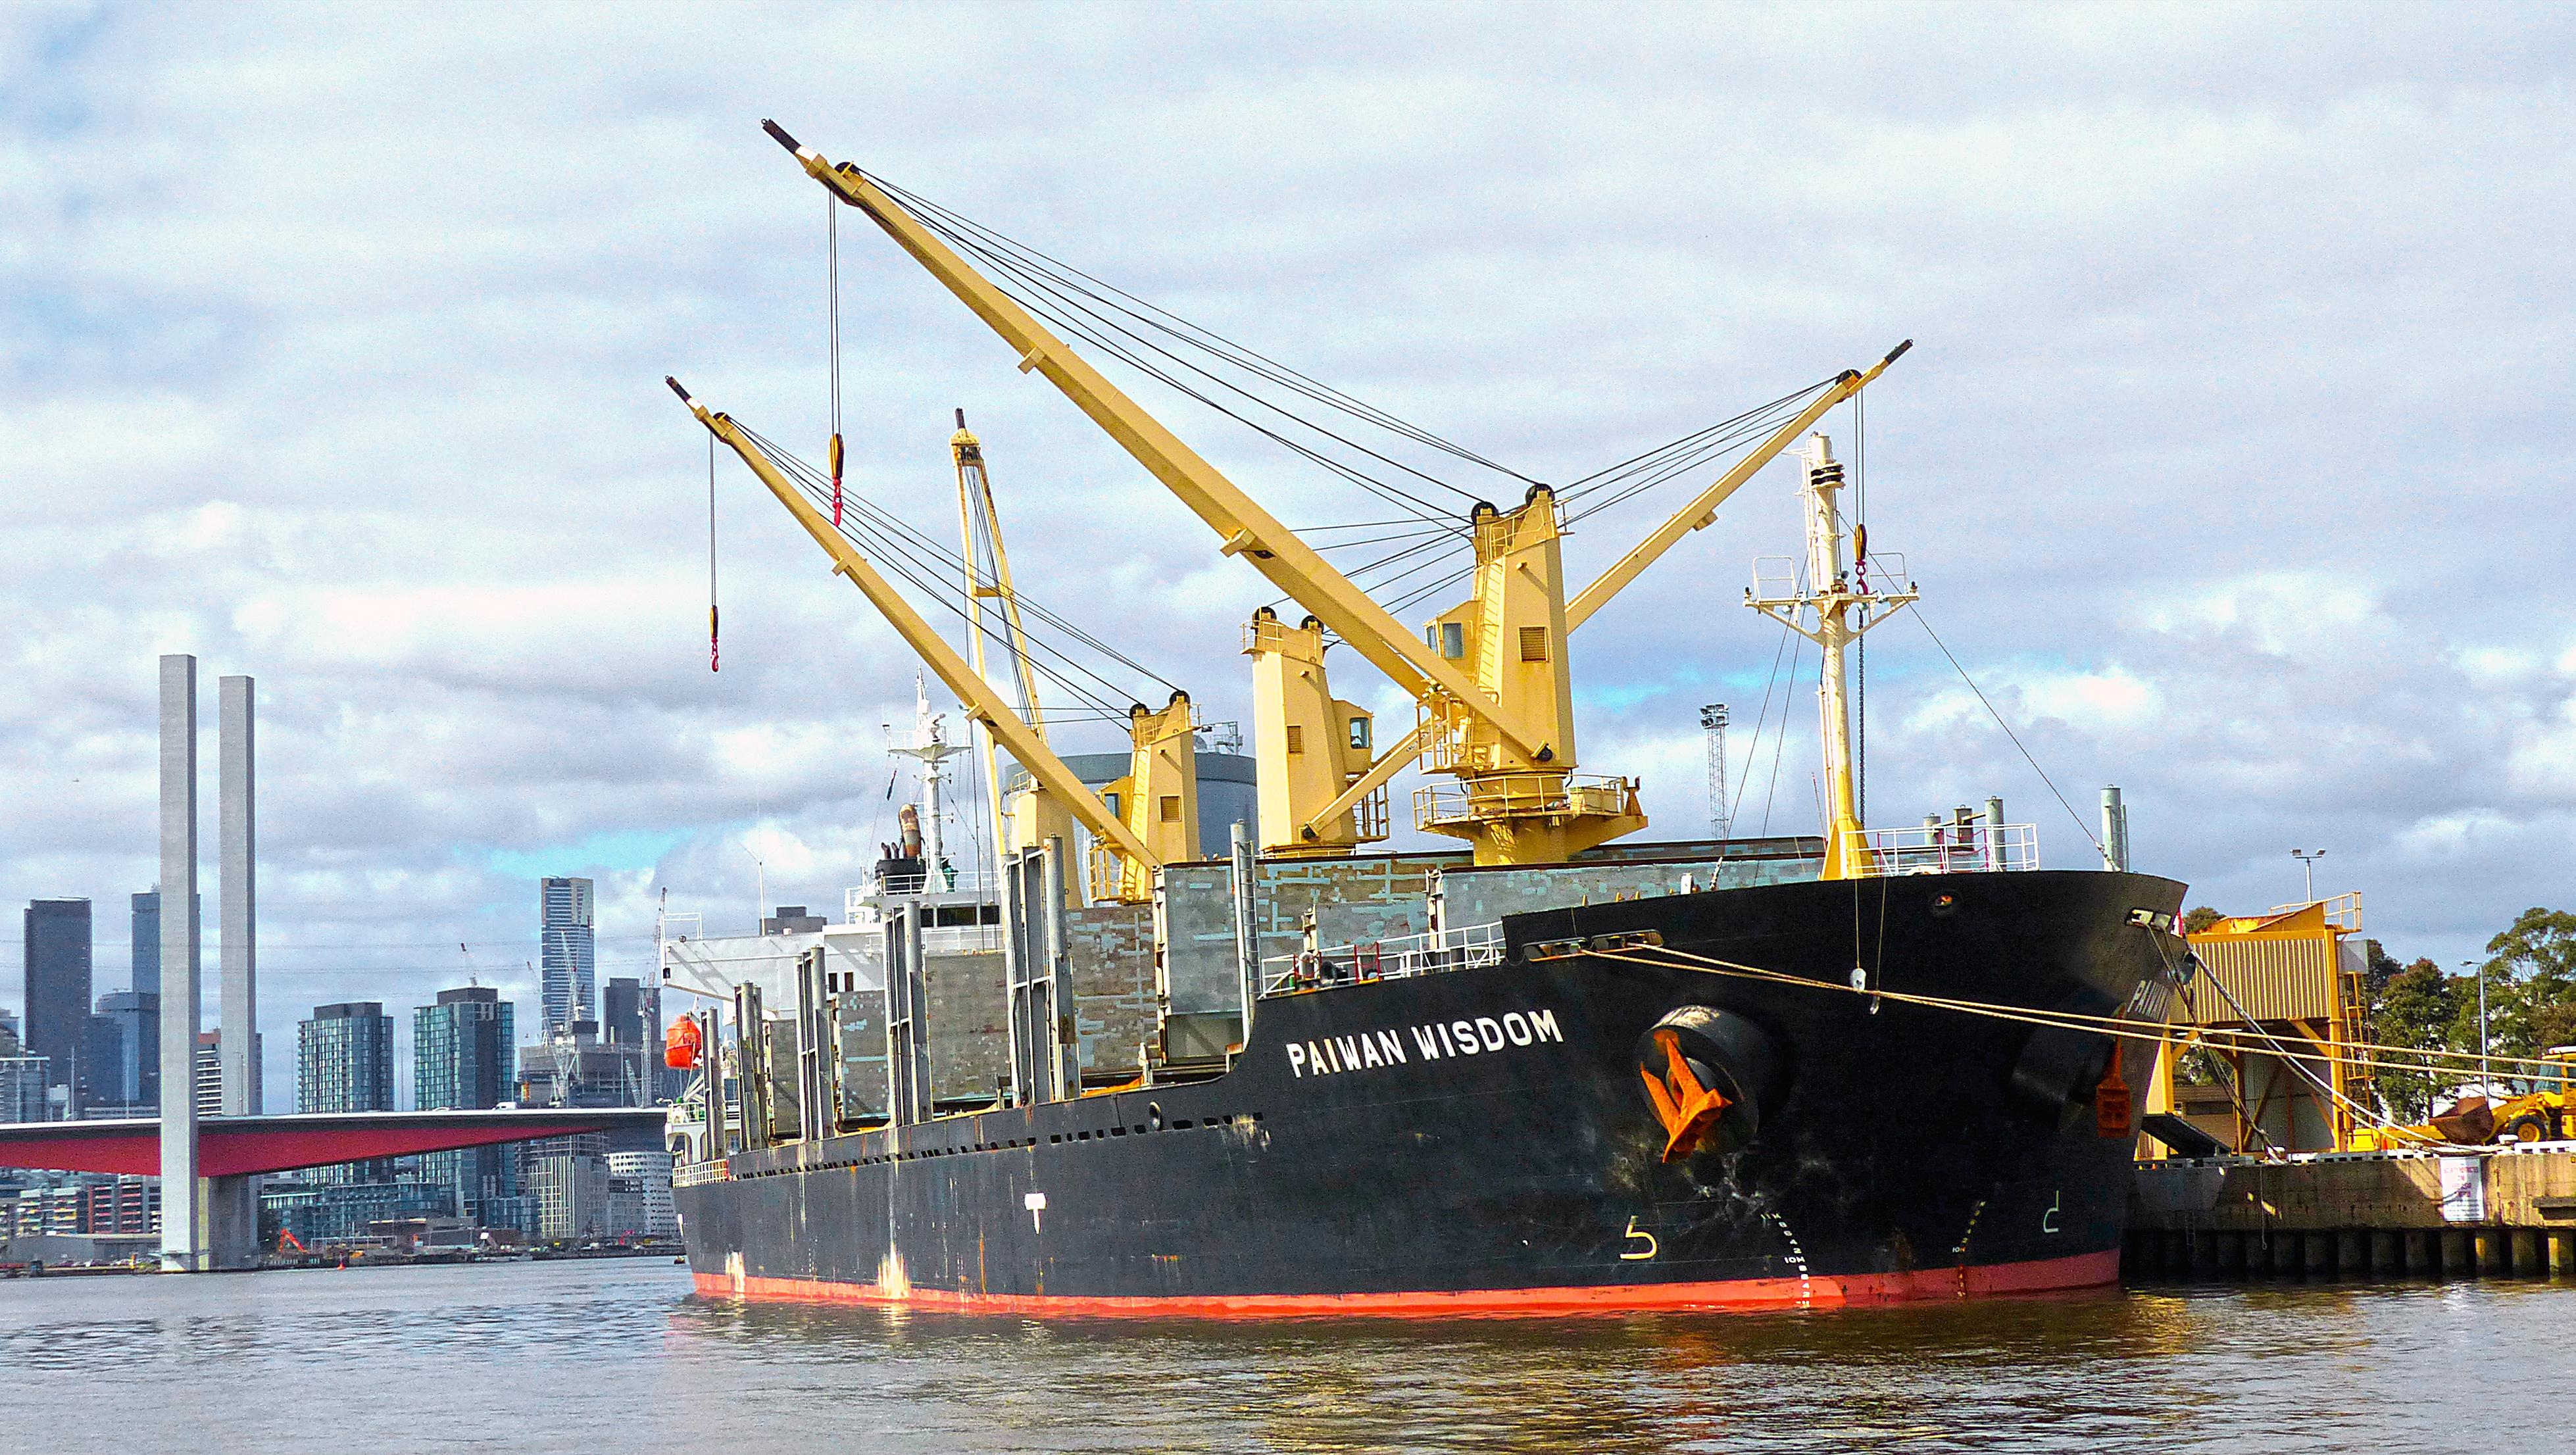 PAIWAN WISDOM. Bulk Carrier, Boat, Boats, Cargo, Cranes, HQ Photo